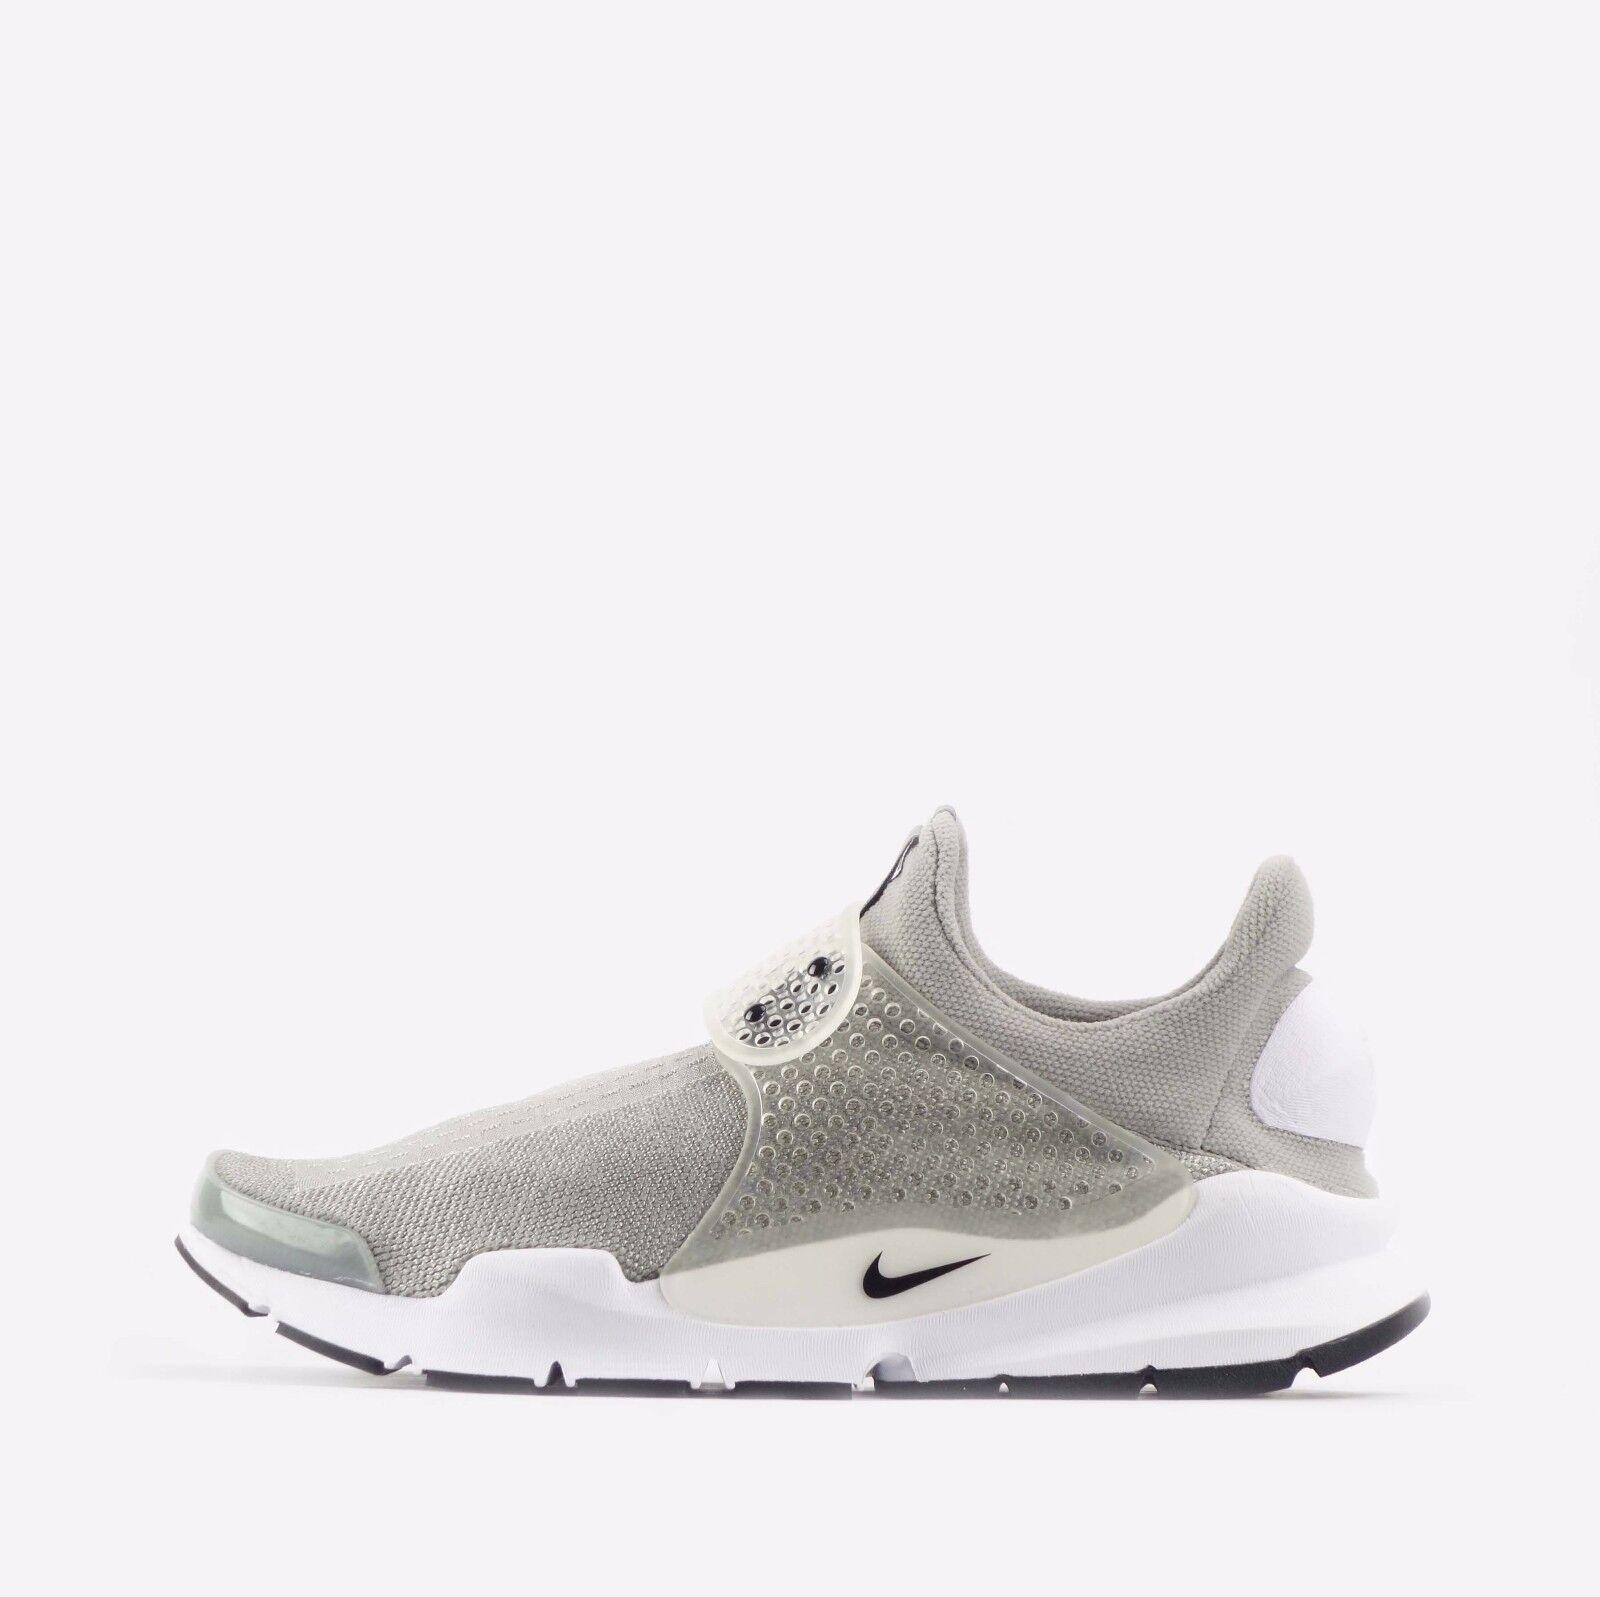 Nike Sock Dart Men's Unisex Shoes Medium Grey